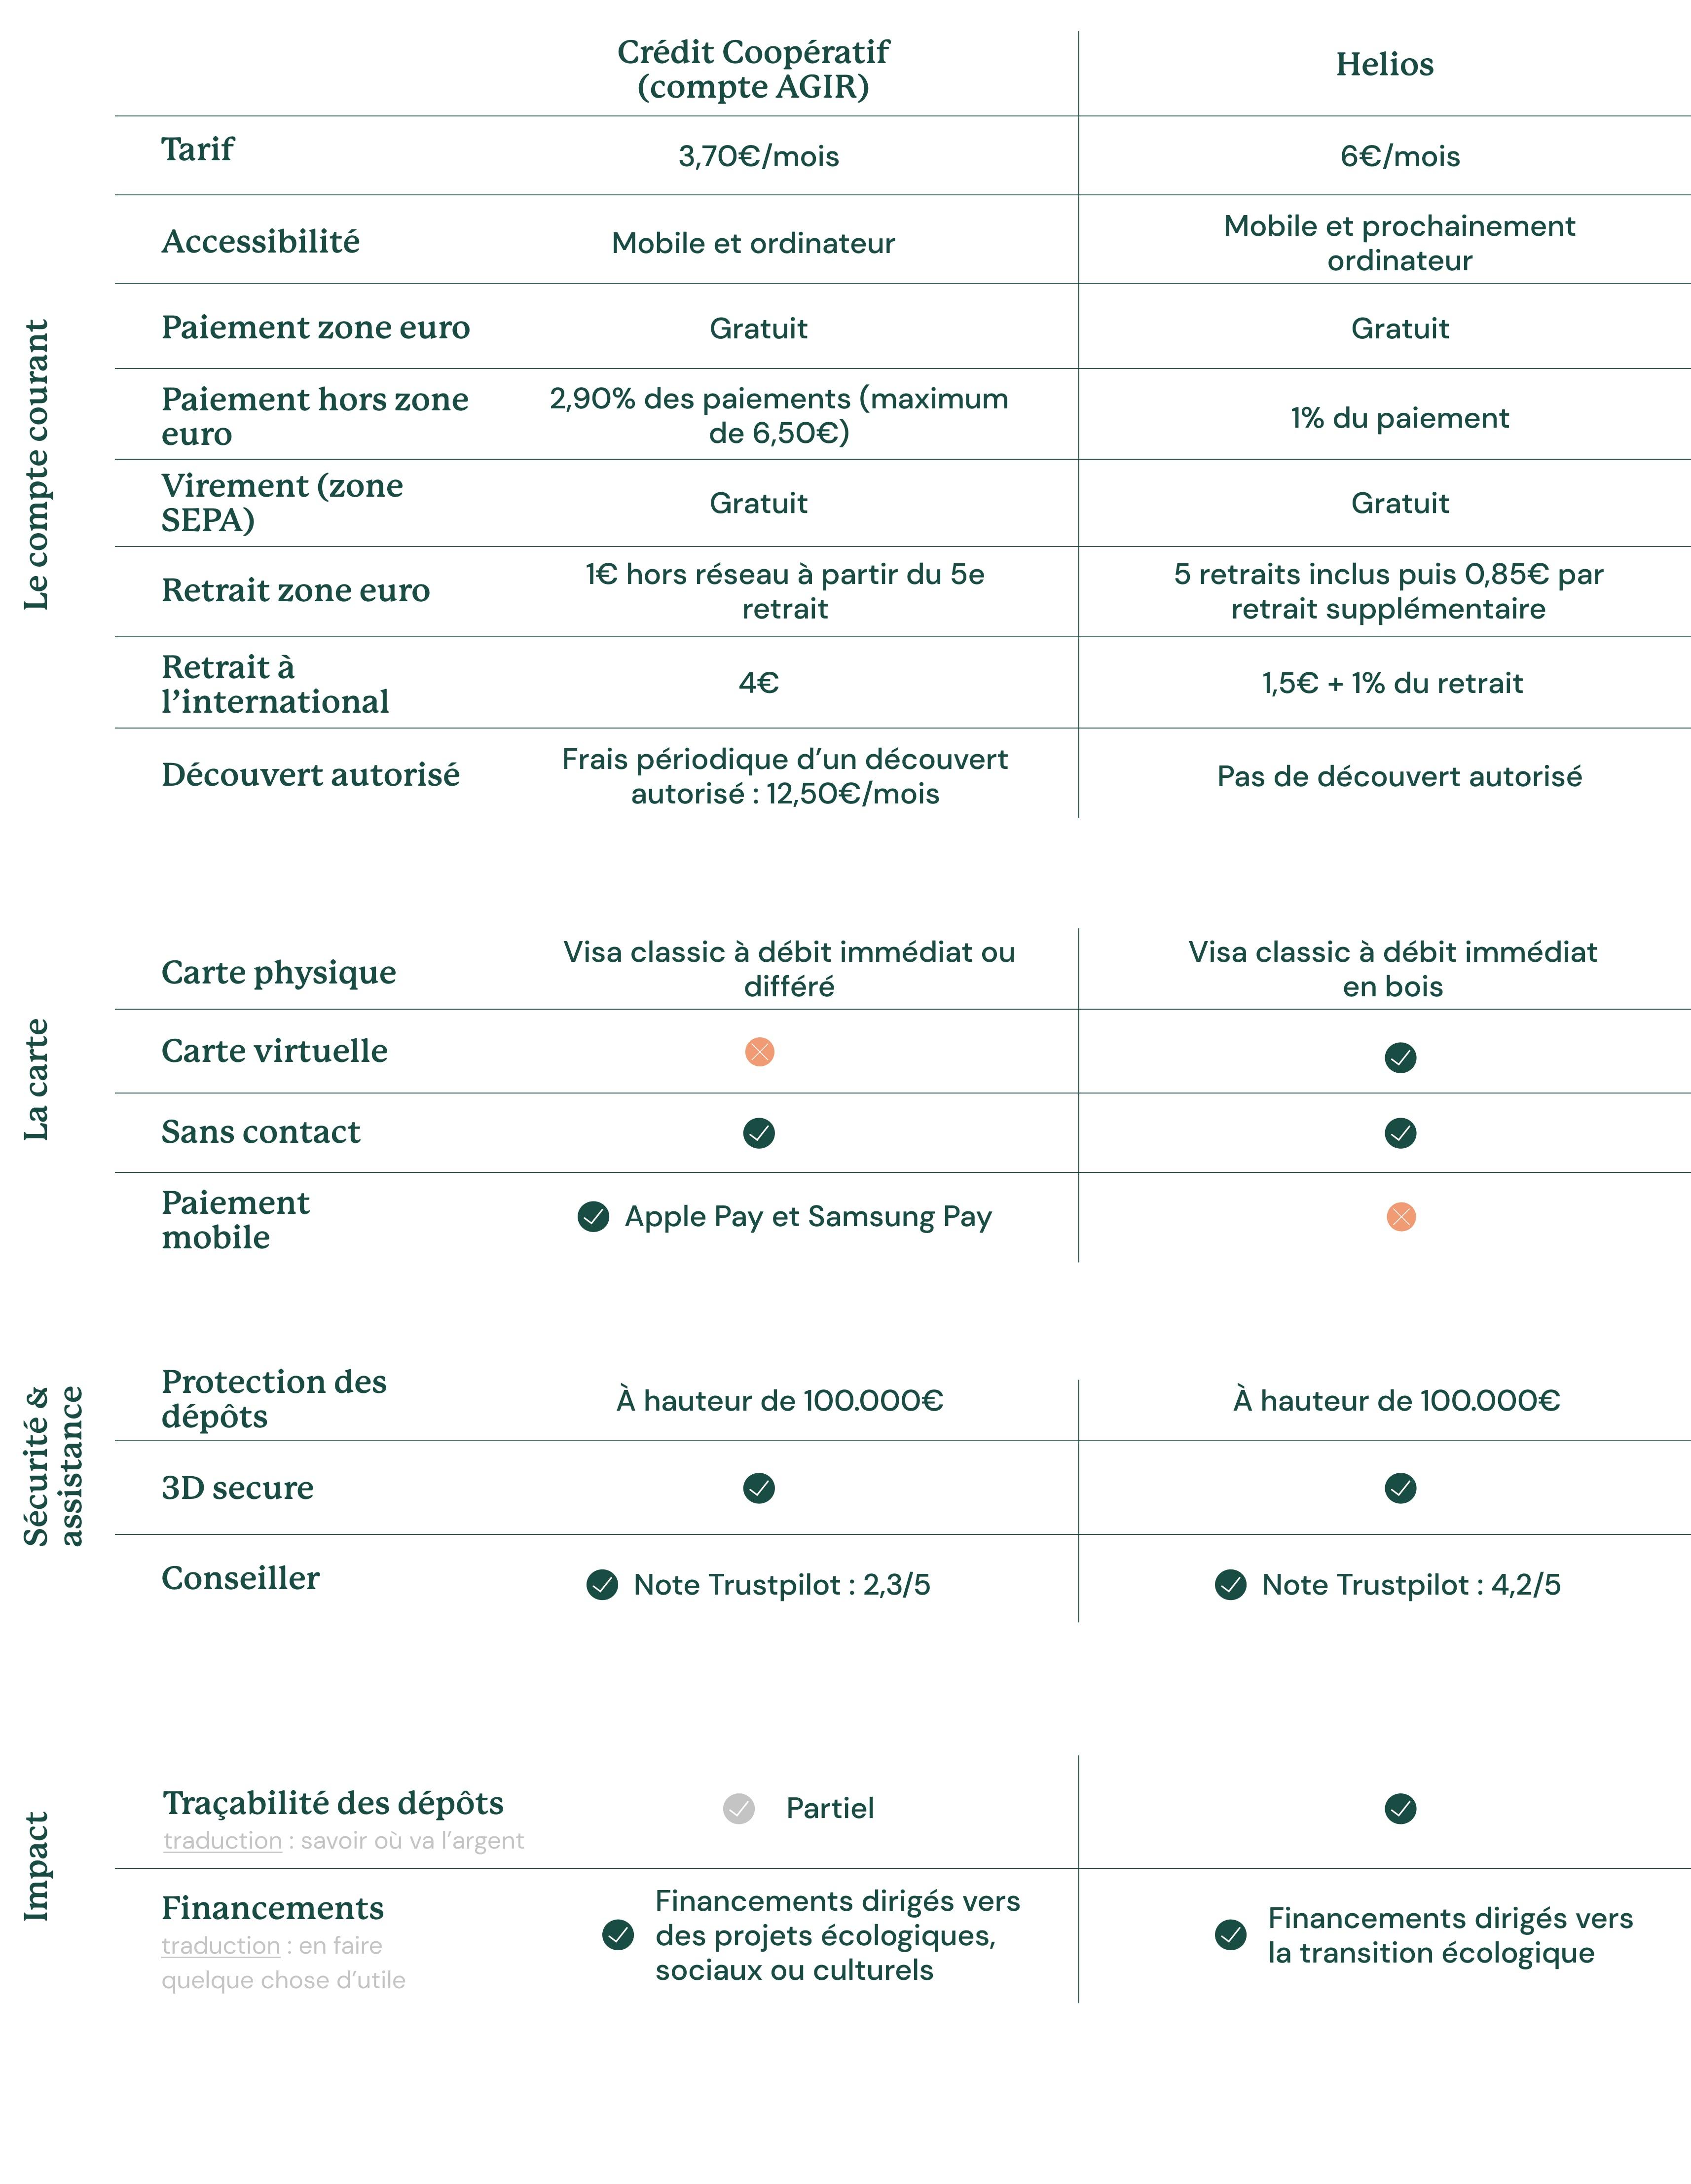 Tableau comparatif helios vs. Compte Agir au 22 Avril 2021